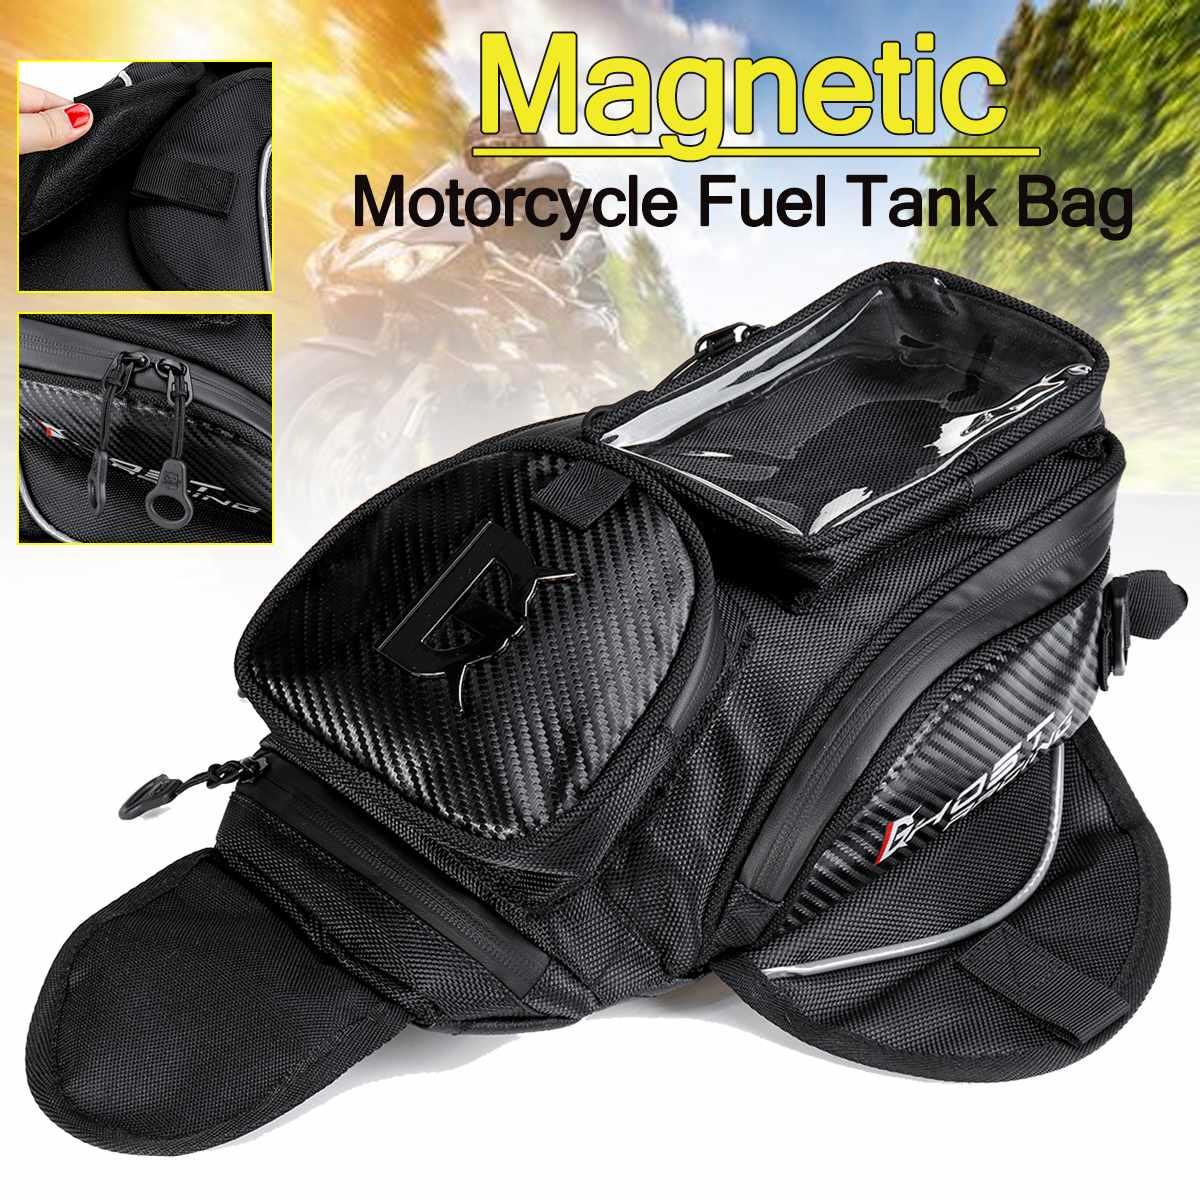 Motorcycle Tank Bag Motorbike Oil Fuel Tank Bag Magnetic Tank Bike Saddle Bag Motorcycle Bag Big Screen for Phone GPS Navigation